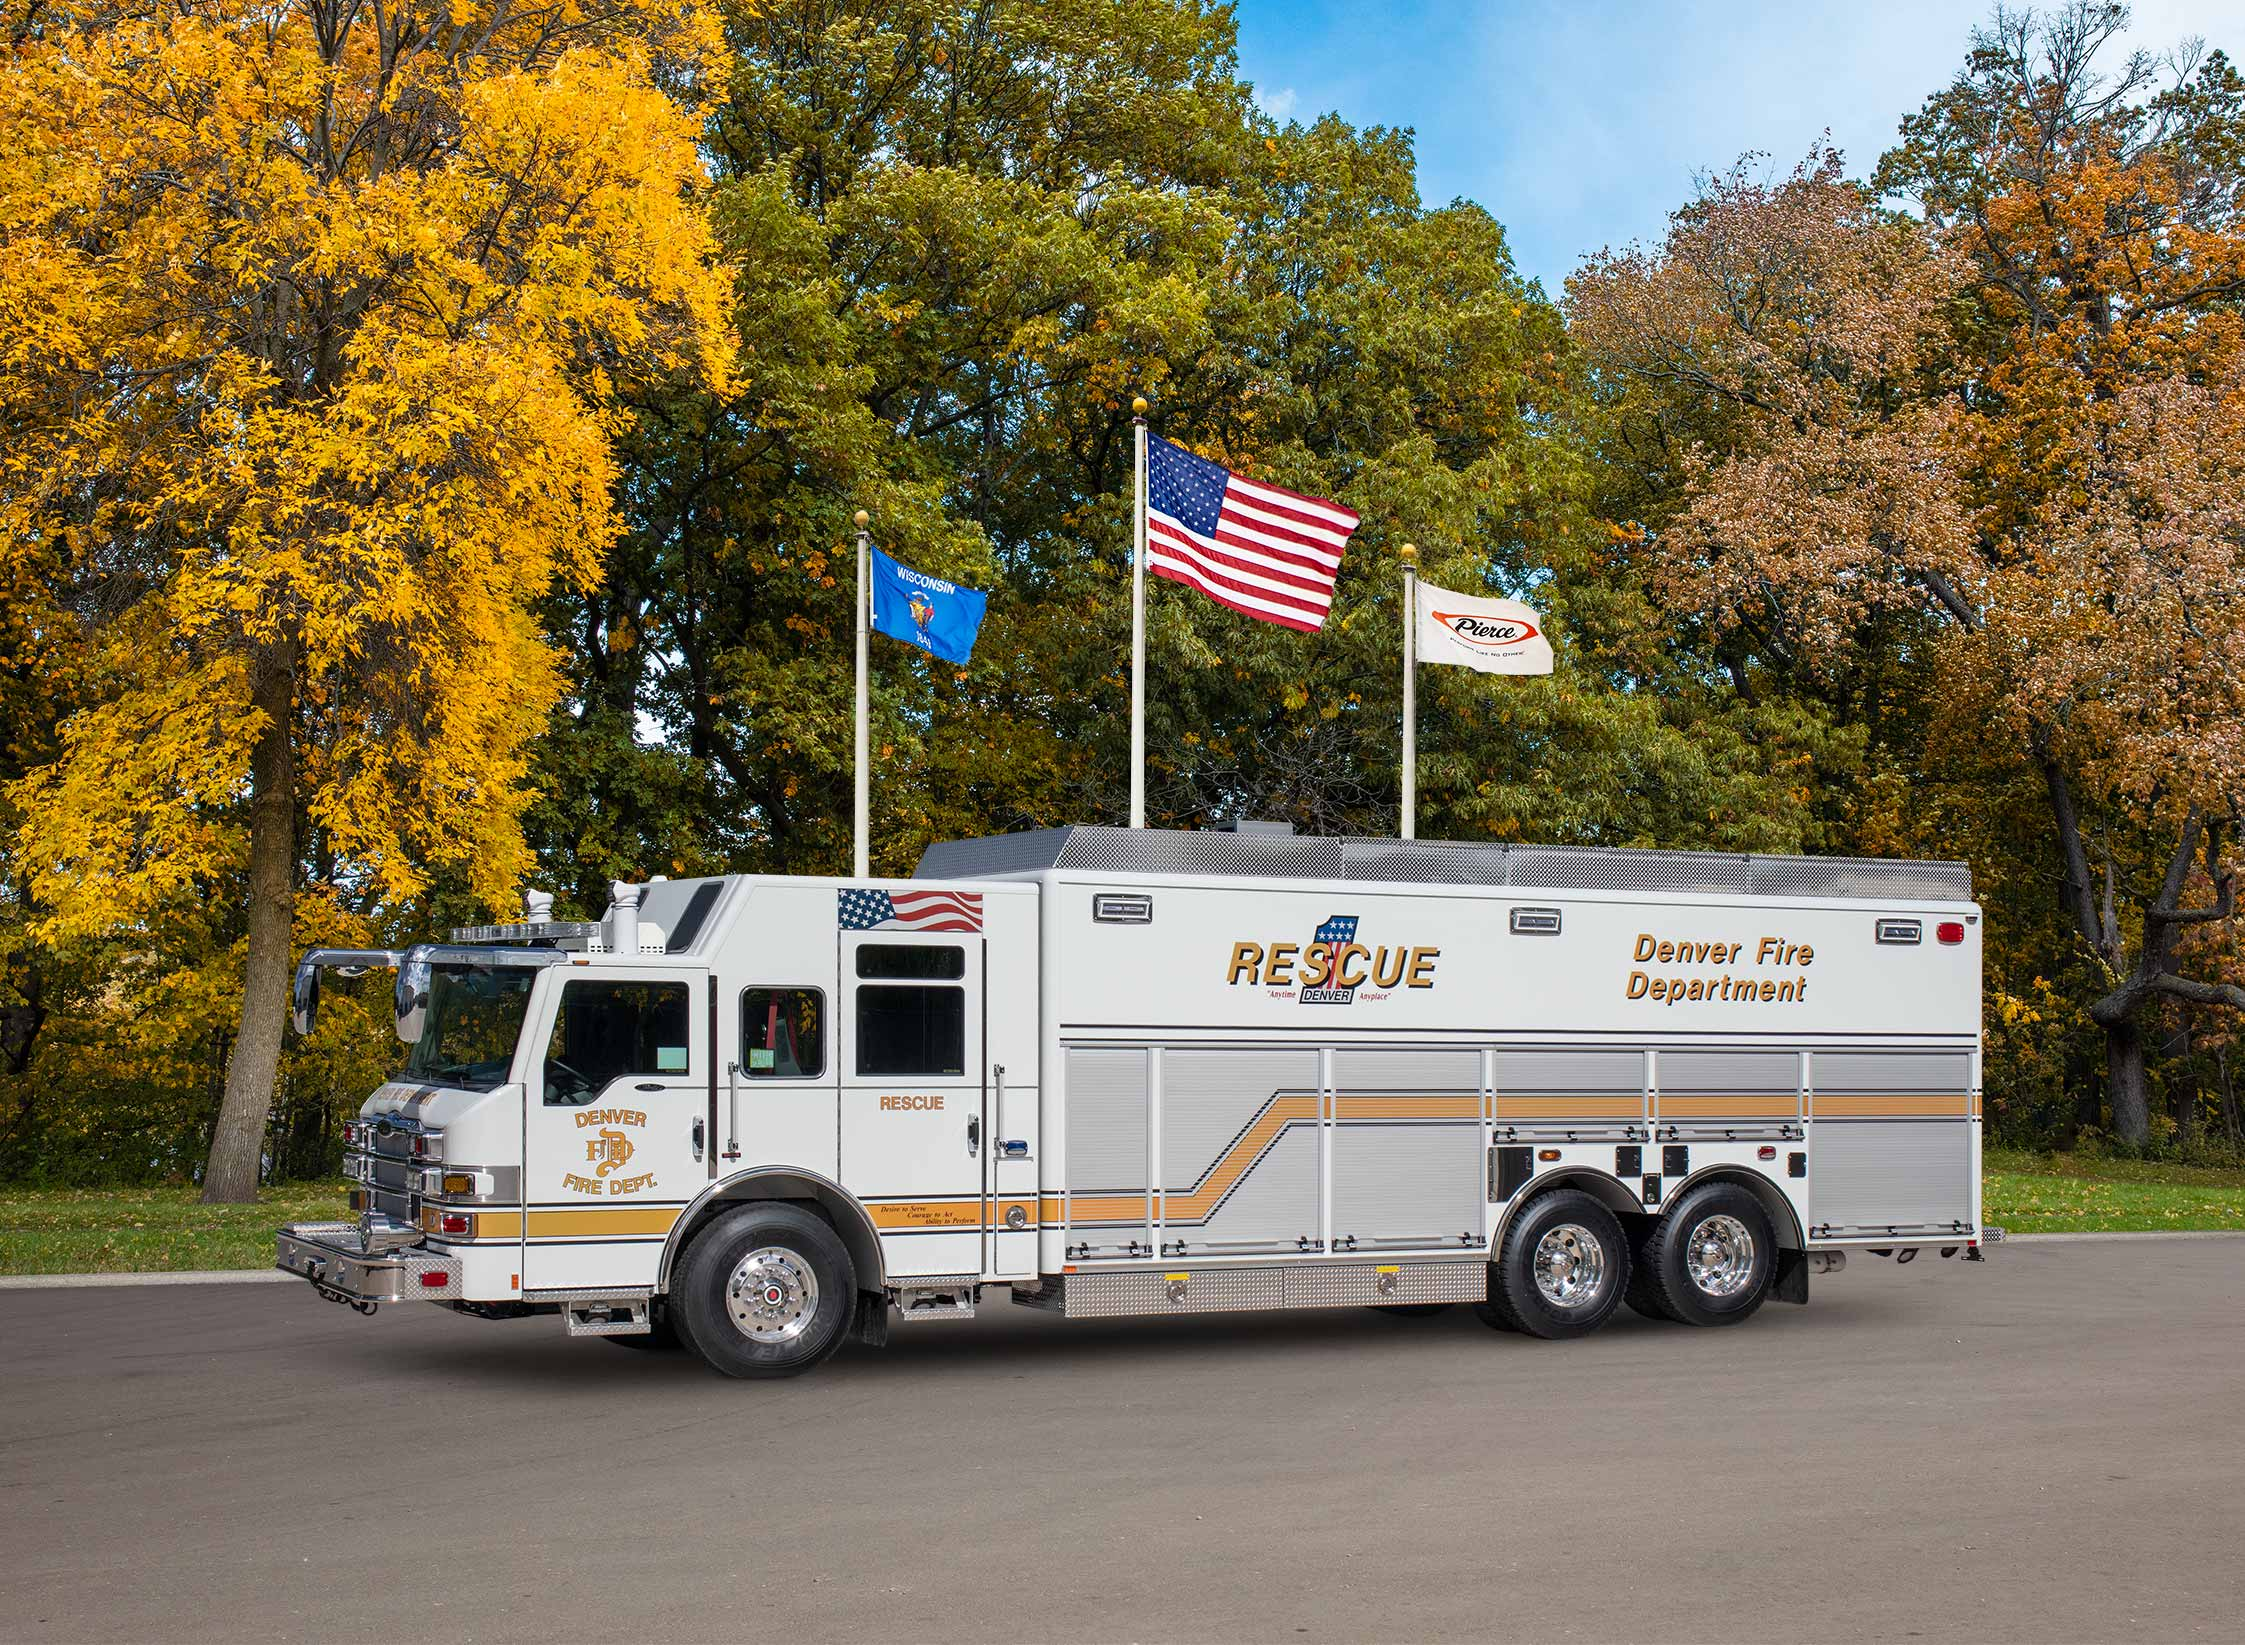 Denver Fire Department - Rescue